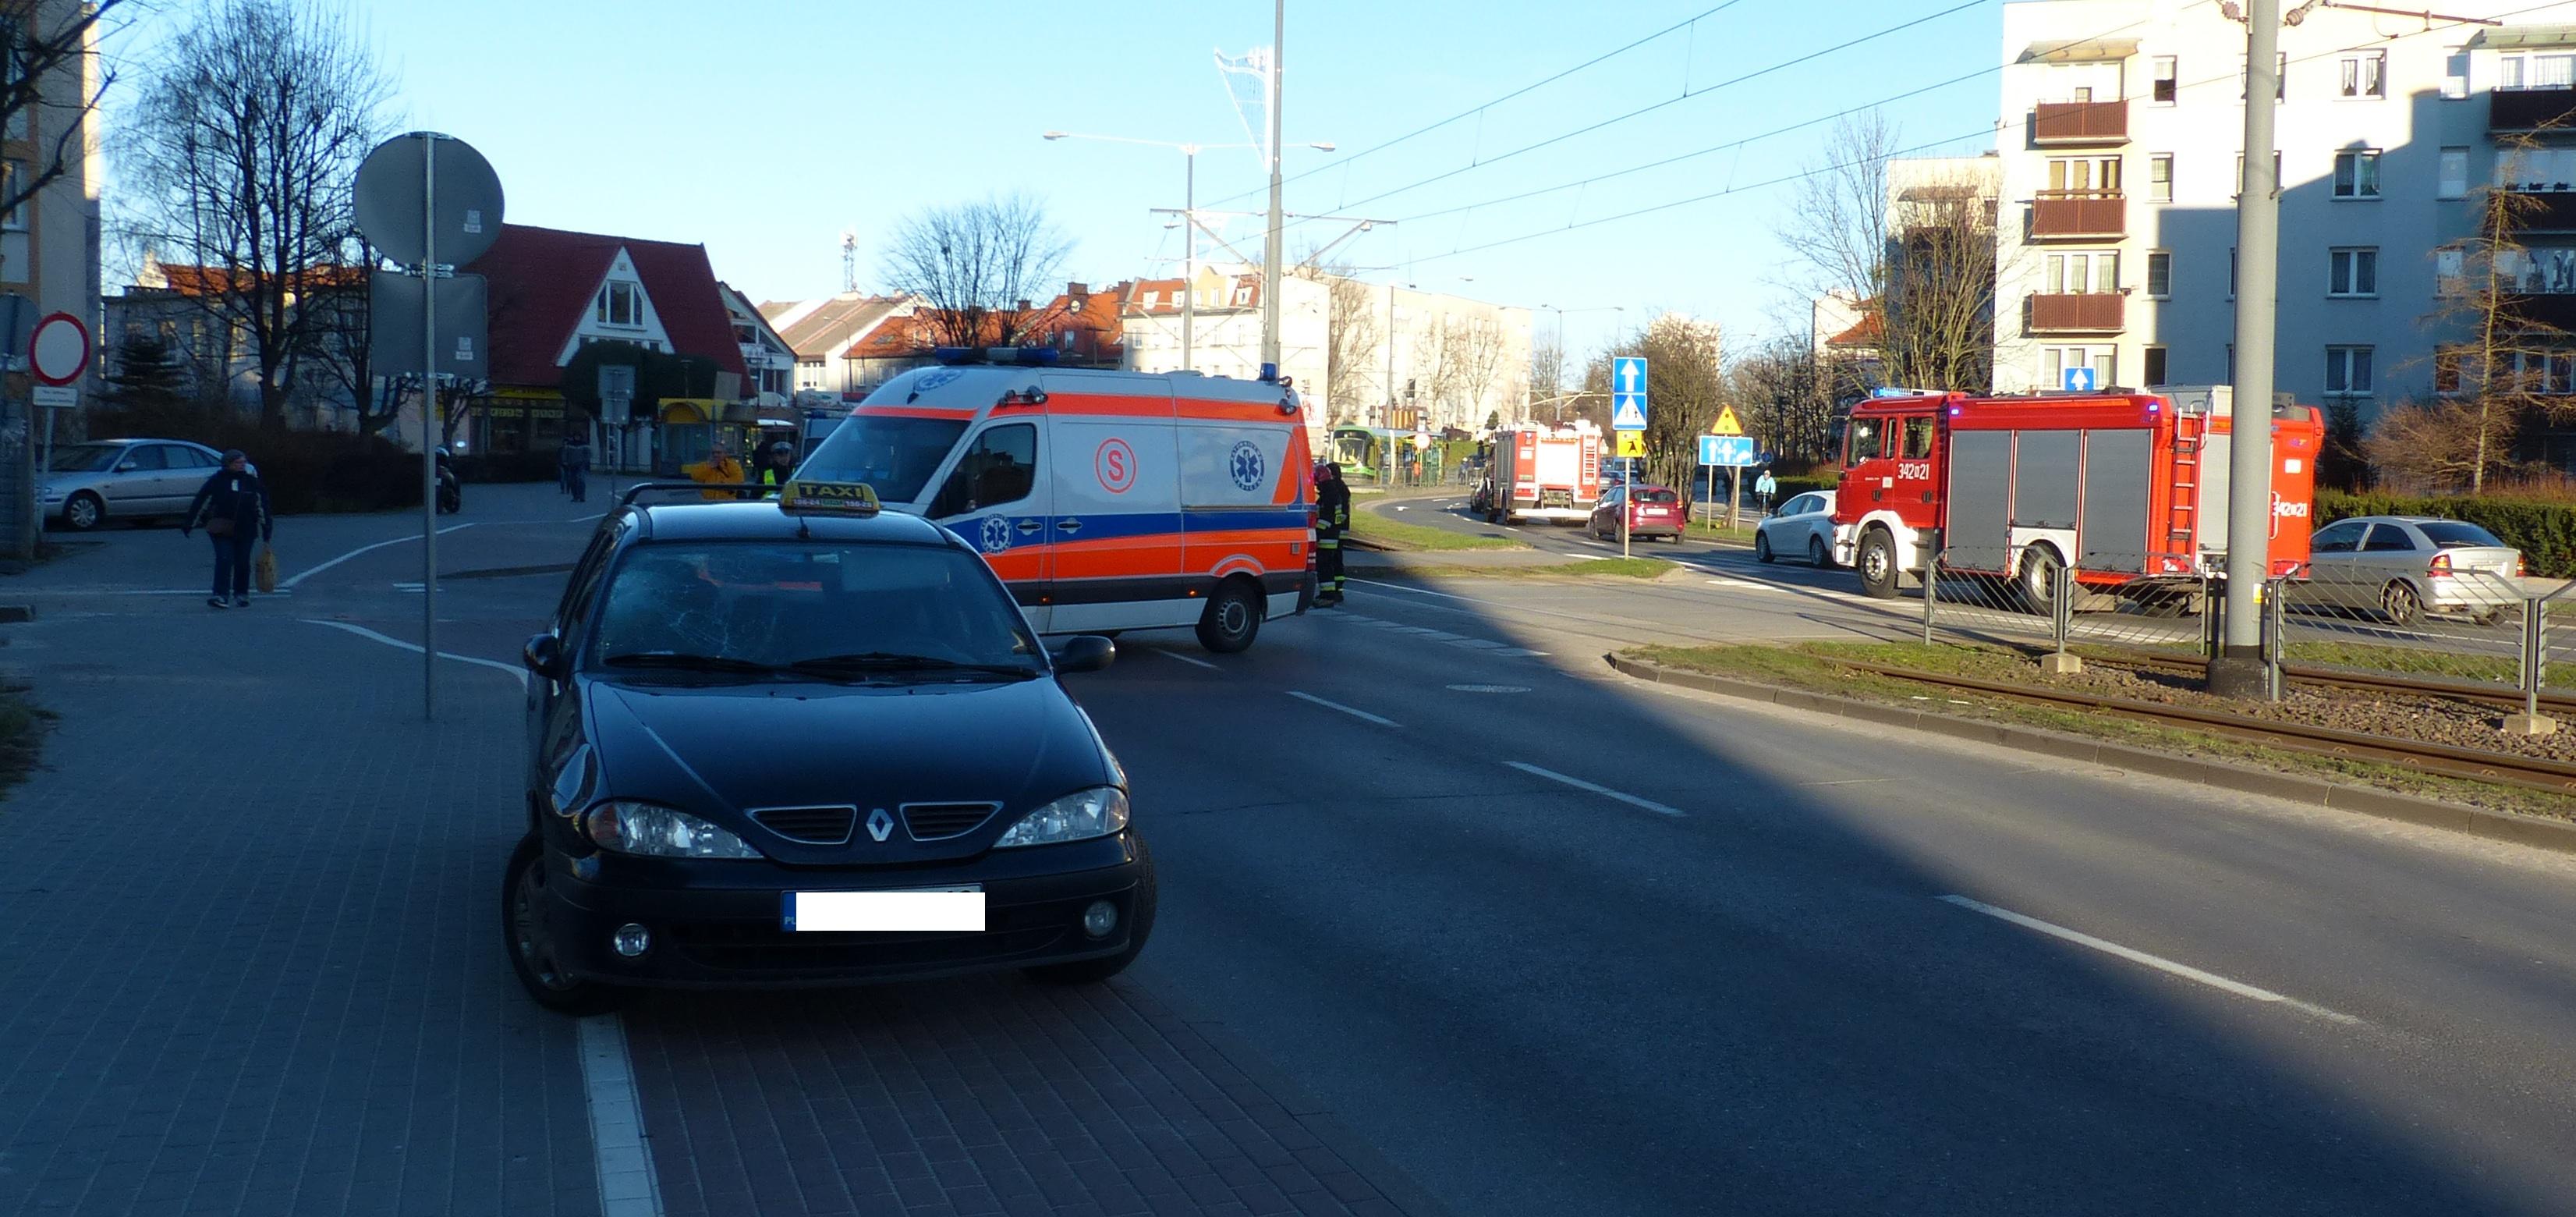 http://m.wm.pl/2015/12/orig/wypadek-2-284880.jpg